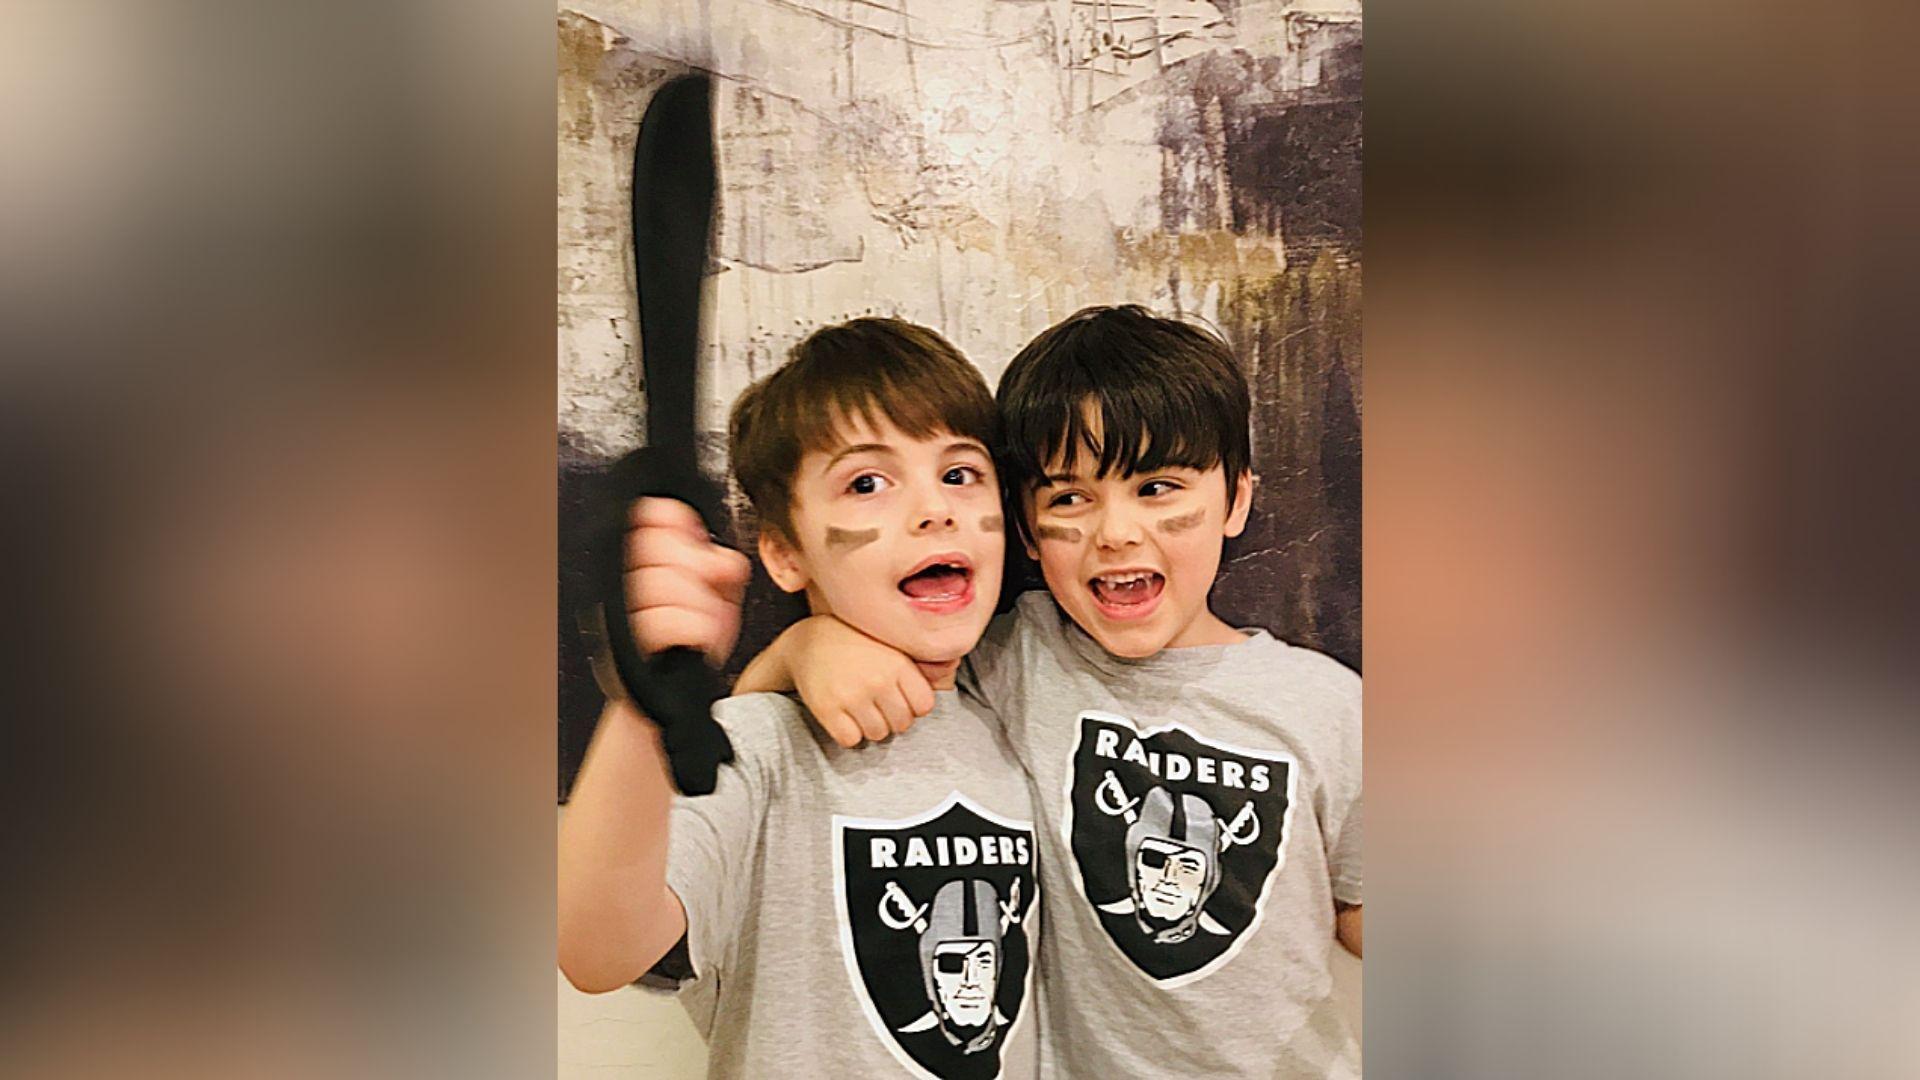 Raiders fans - Kari Michaels.jpg